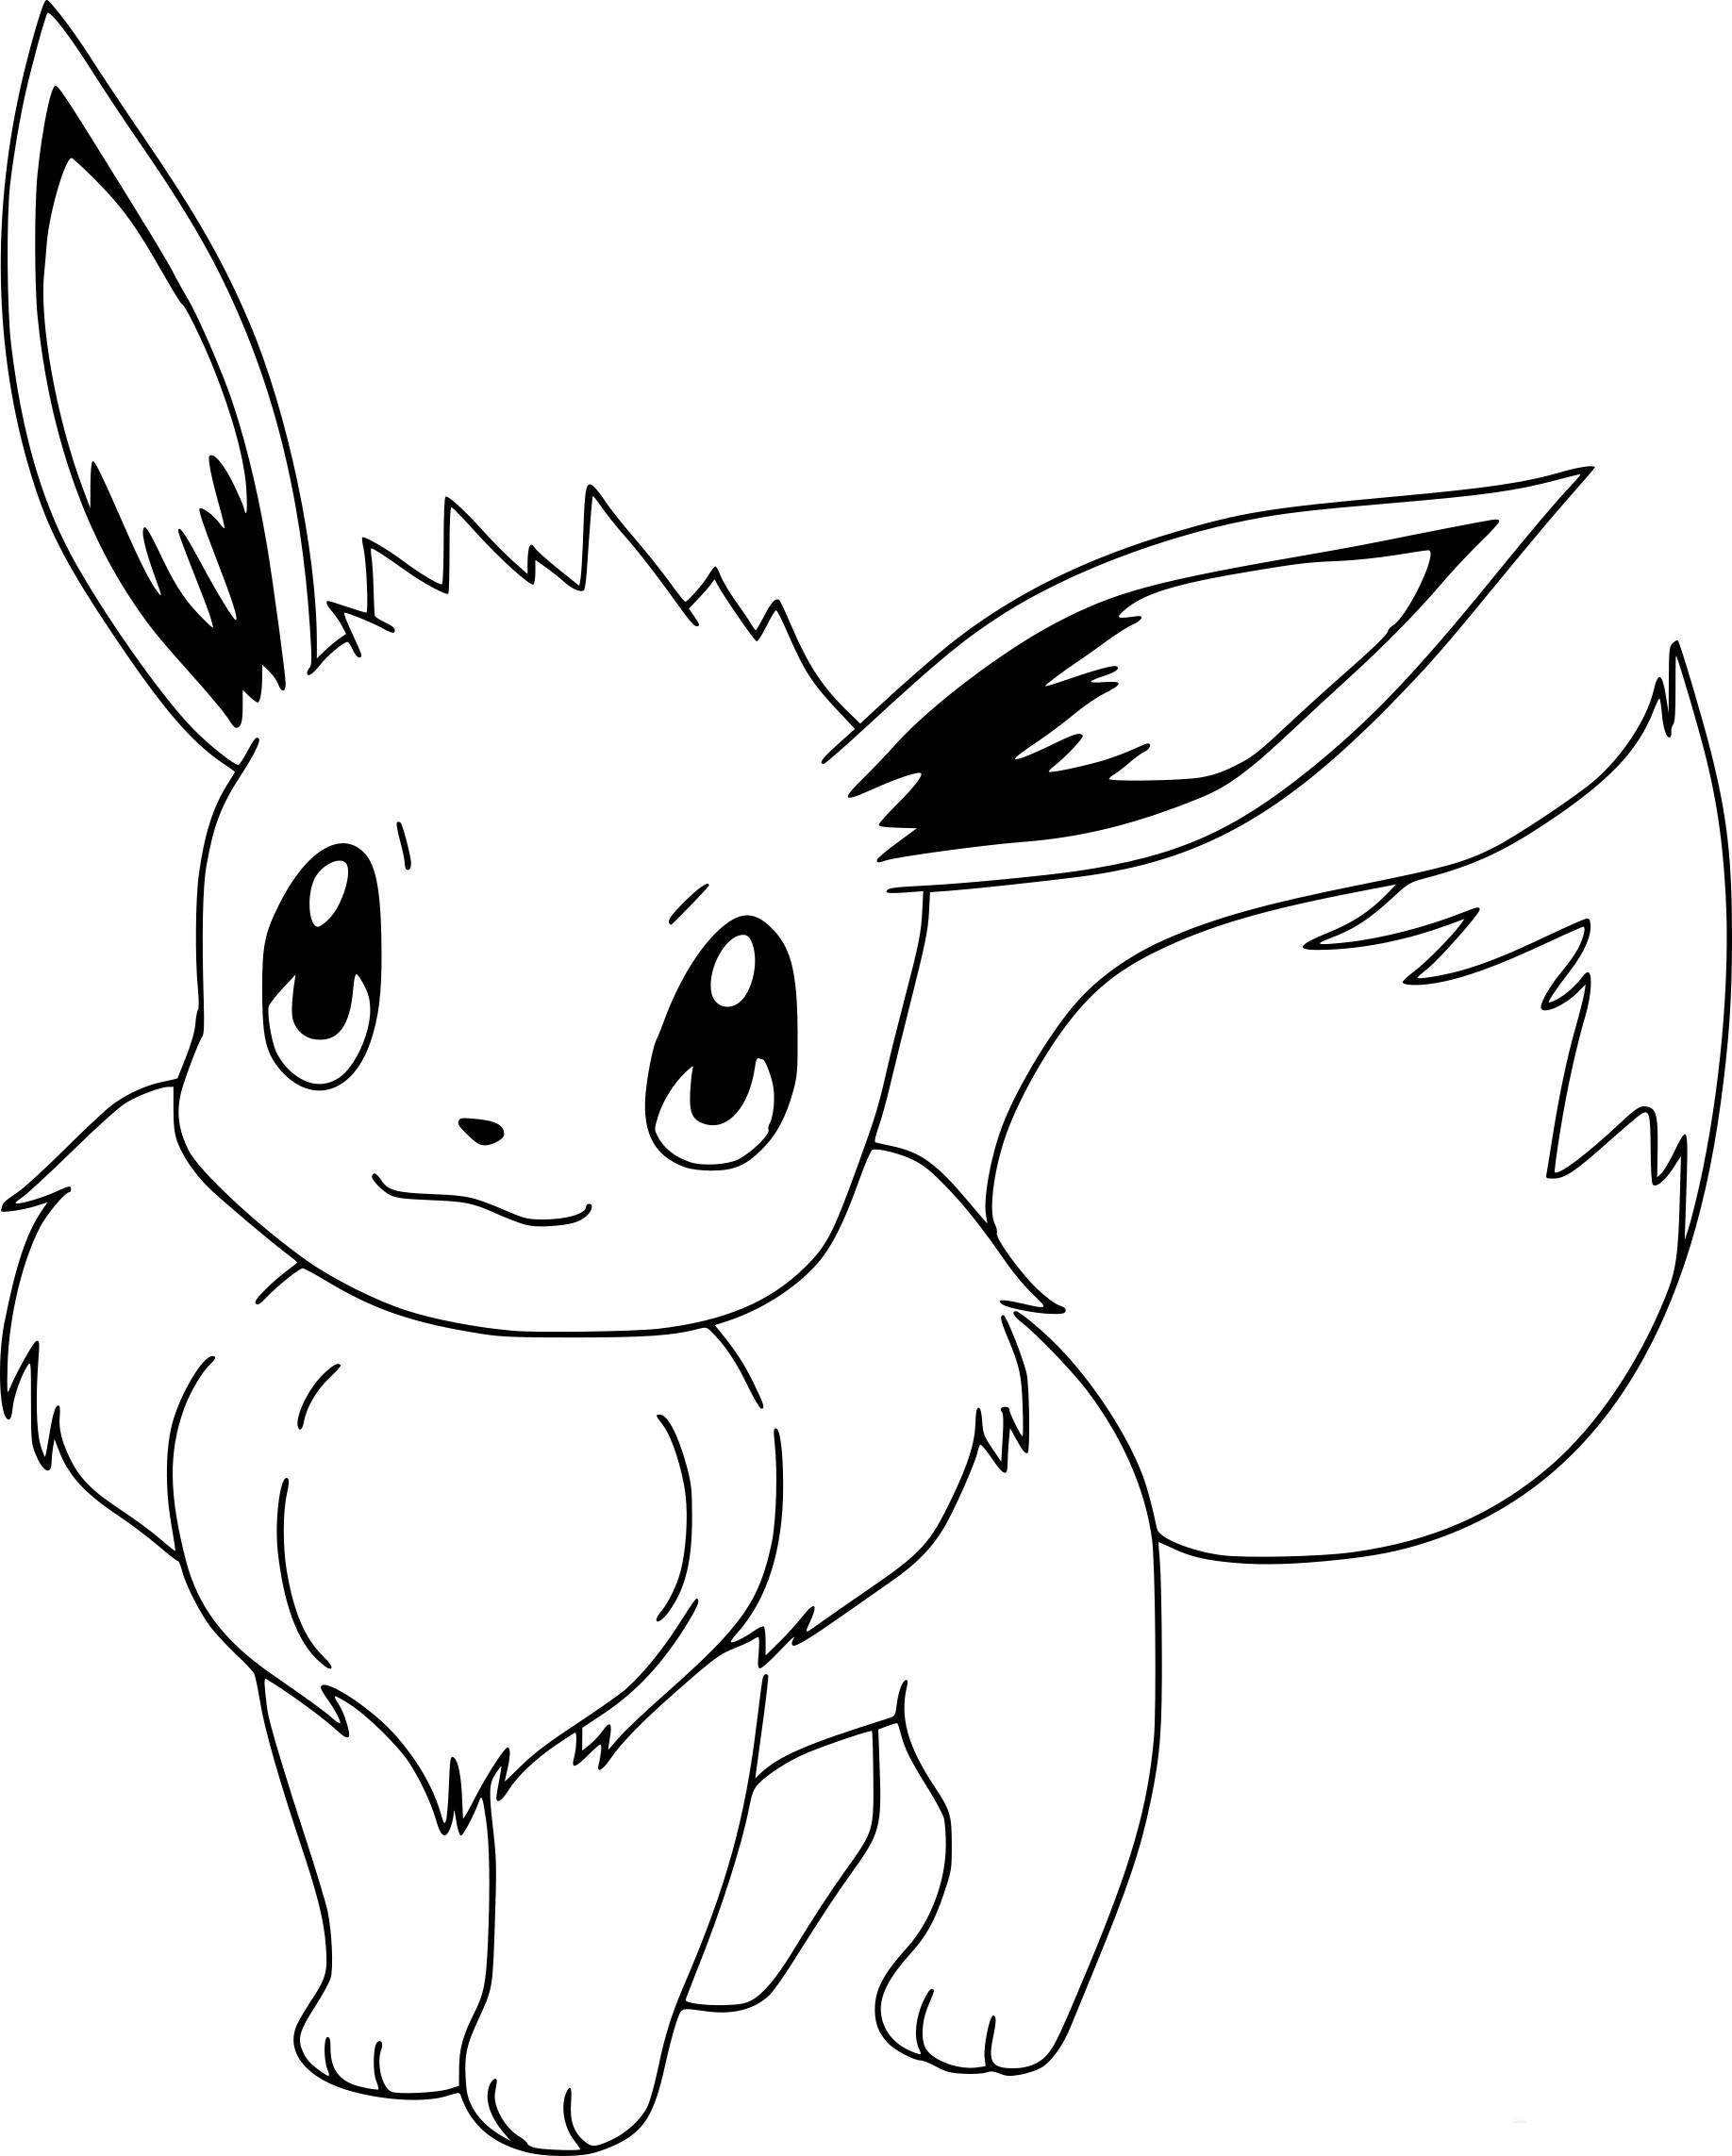 Coloriage Pokemon Evoli Dessin À Imprimer Sur Coloriages intérieur Imprimer Coloriage Pokemon